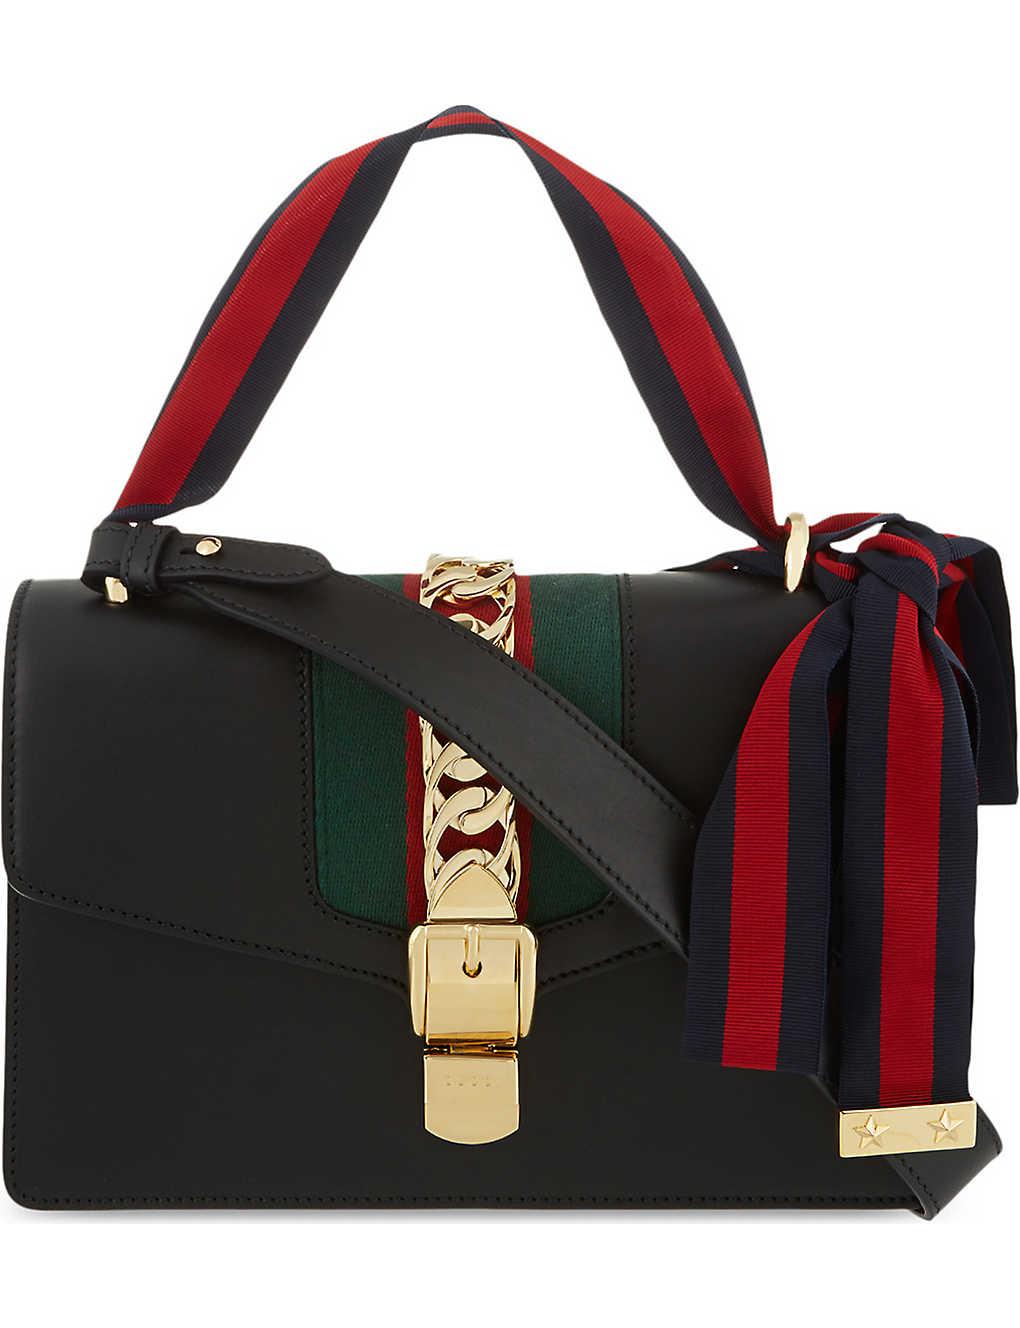 GUCCI - Sylvie leather shoulder bag   Selfridges.com 9f09204d310